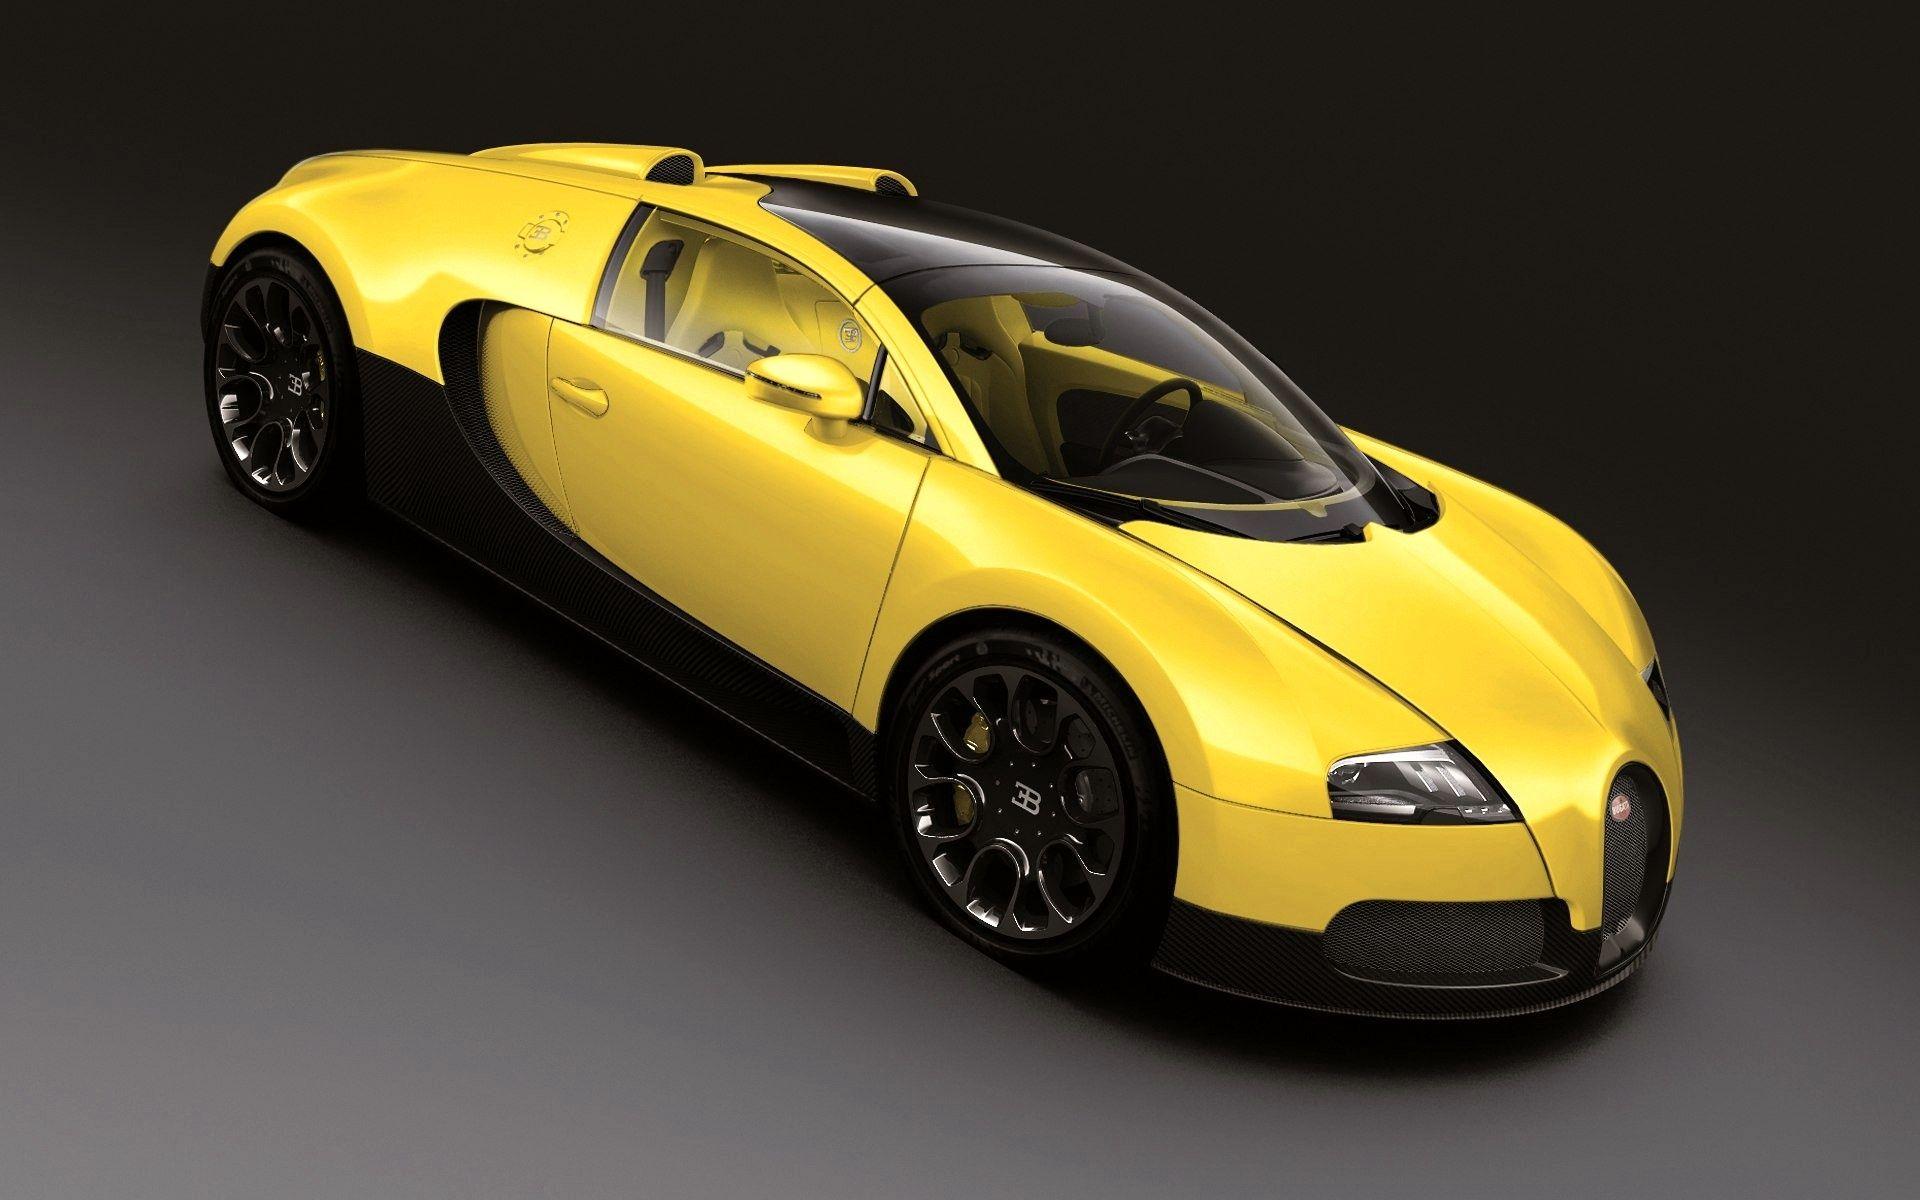 fe7264c3830eb65241e4c916f8ee683d Fascinating Bugatti Veyron Grand Sport Vitesse 1/4 Mile Cars Trend